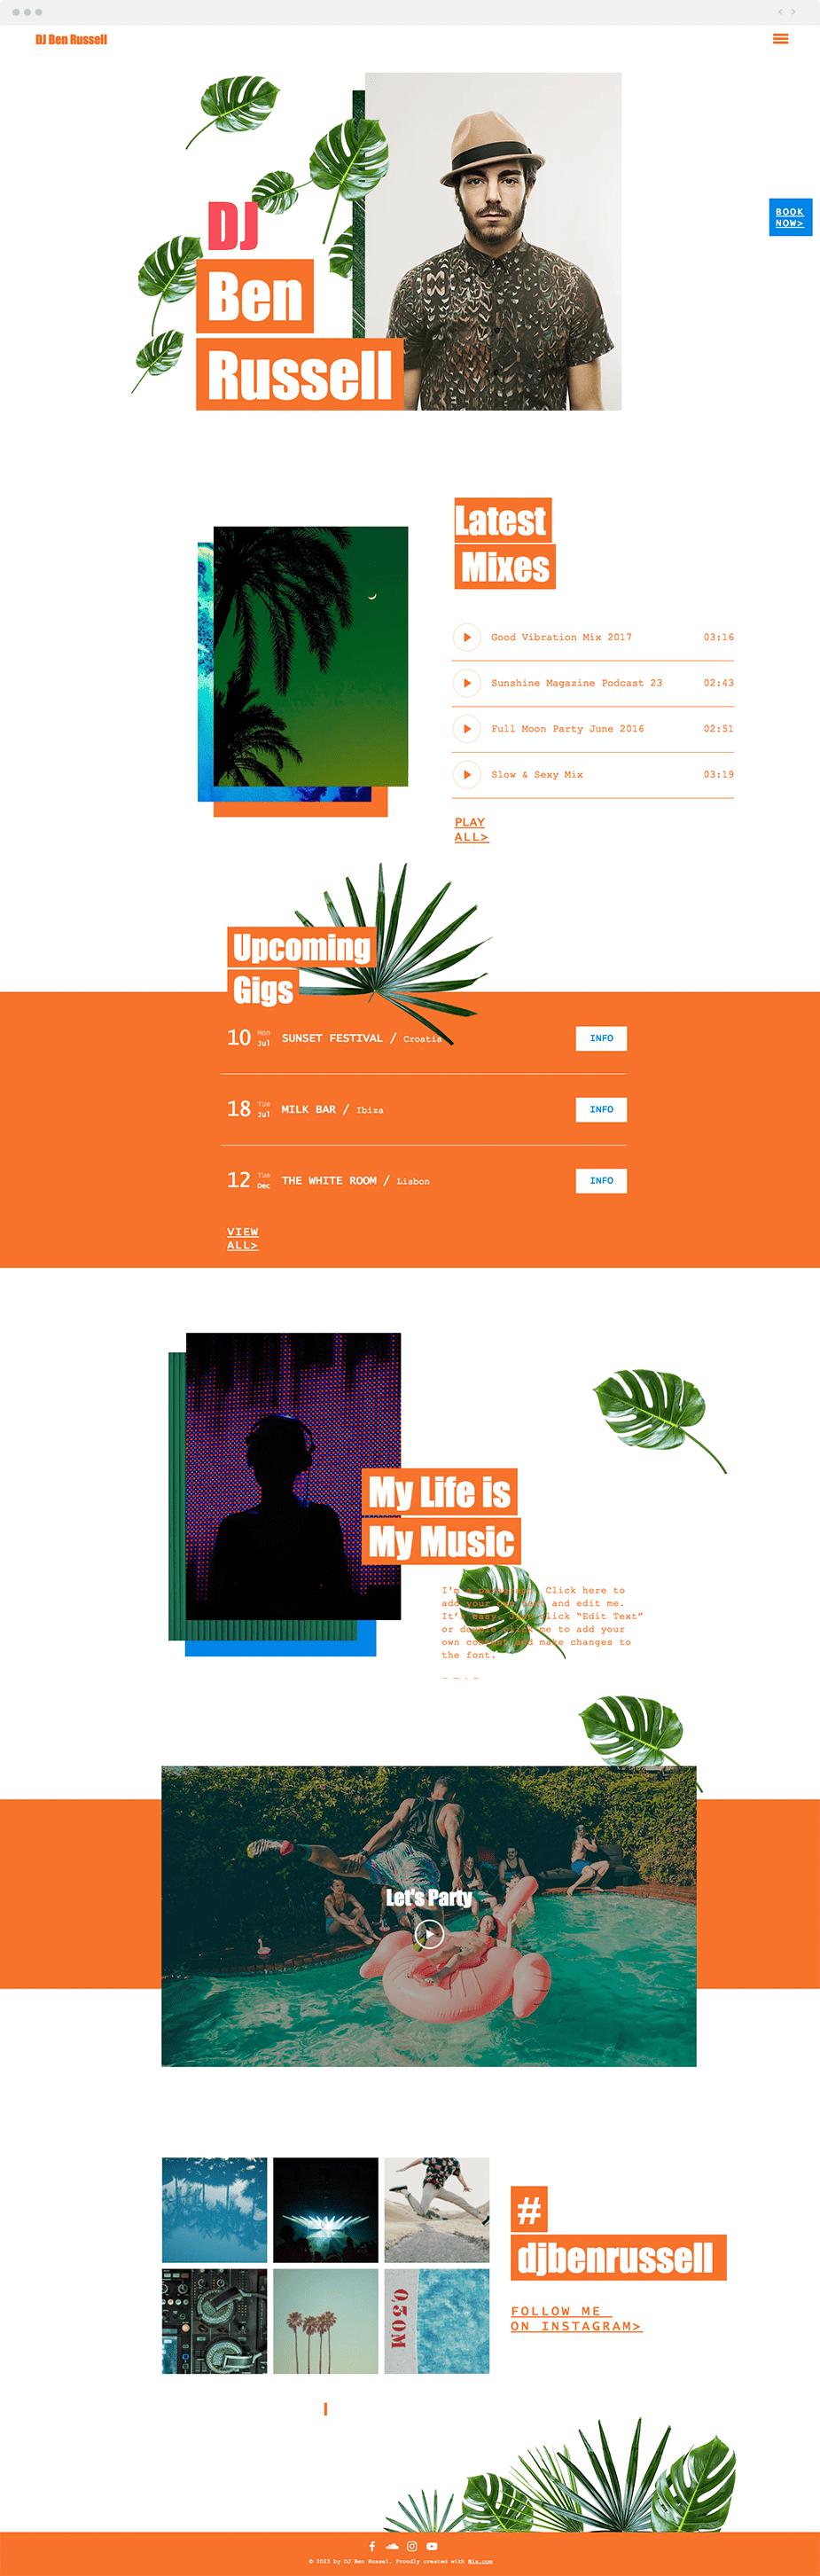 Plantilla para DJs